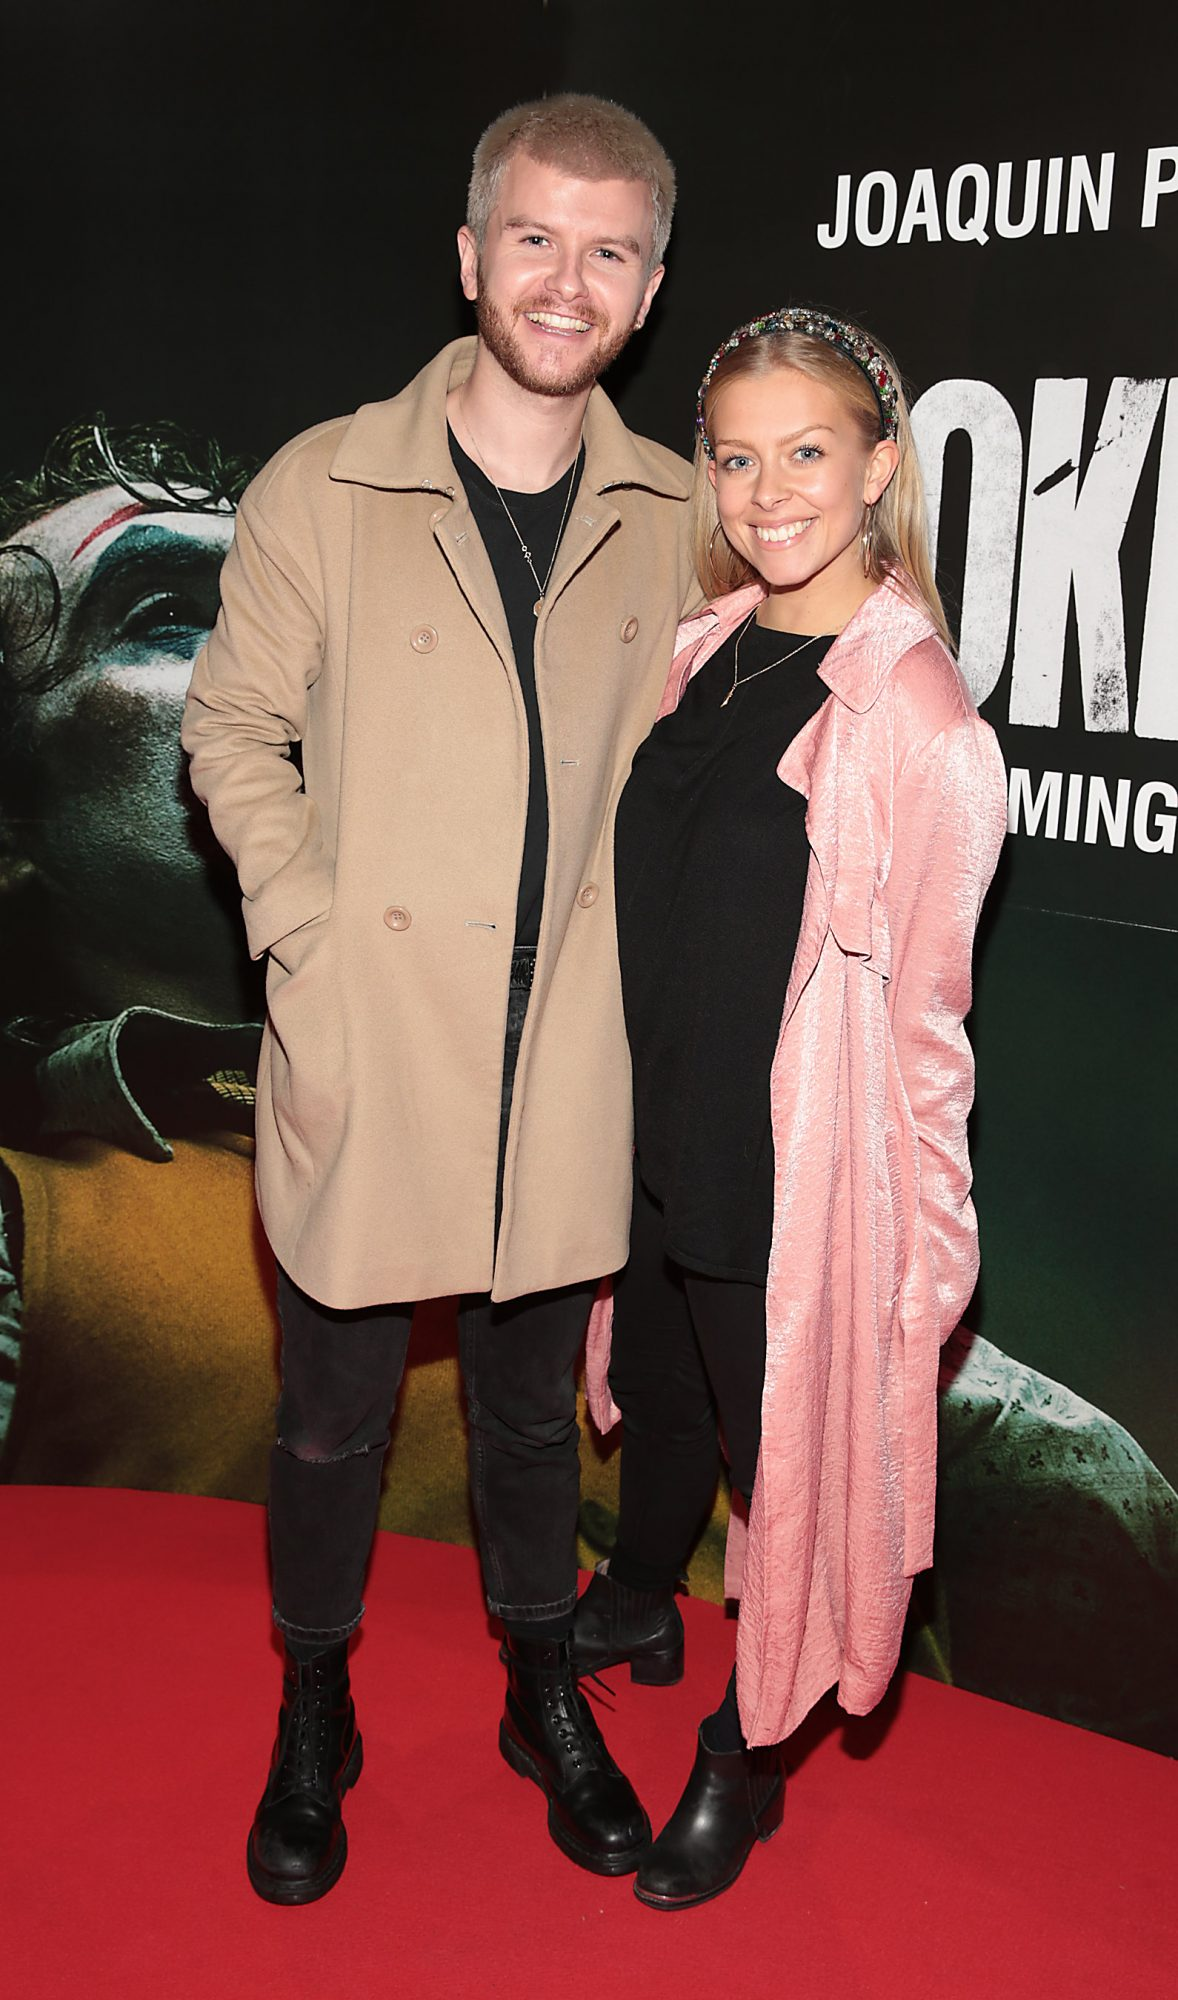 David Whelan and Ruth Devine at the Irish Premiere screening of Joker at Cineworld, Dublin. Pic: Brian McEvoy.